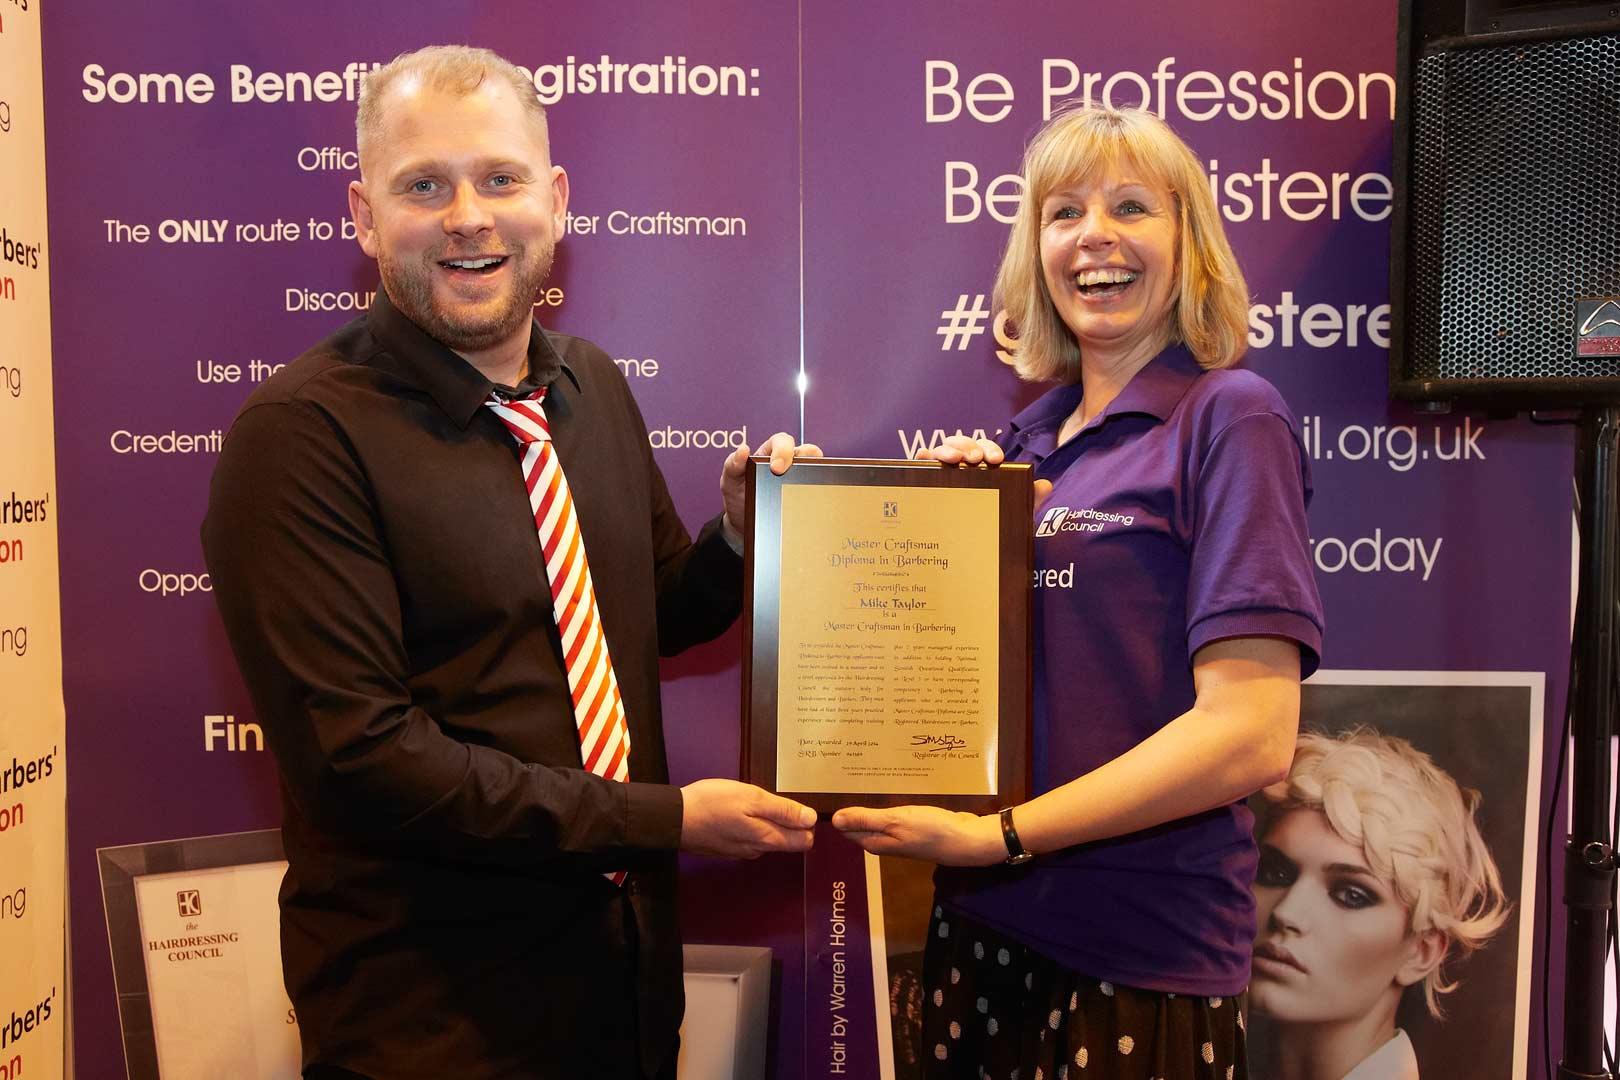 Mike Taylor Education Award